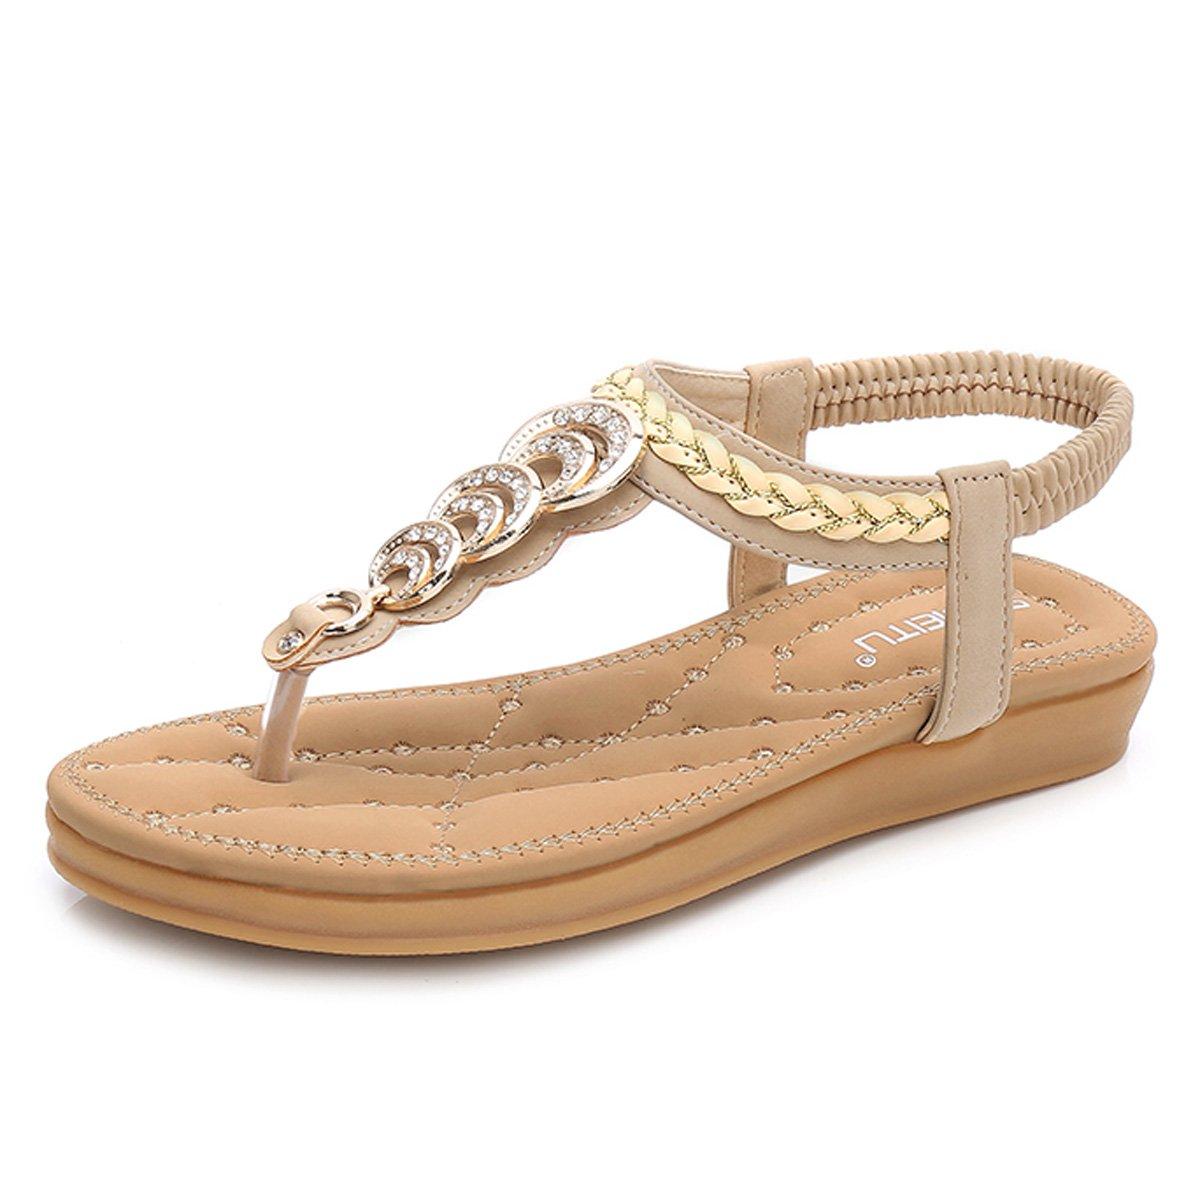 gracosy Damen Sandalen, Flip Flops Sommer Sandals Flach Zehentrenner T-Strap Offen Bouml;hmische Strand Schuhe  39 EU|Beige-a